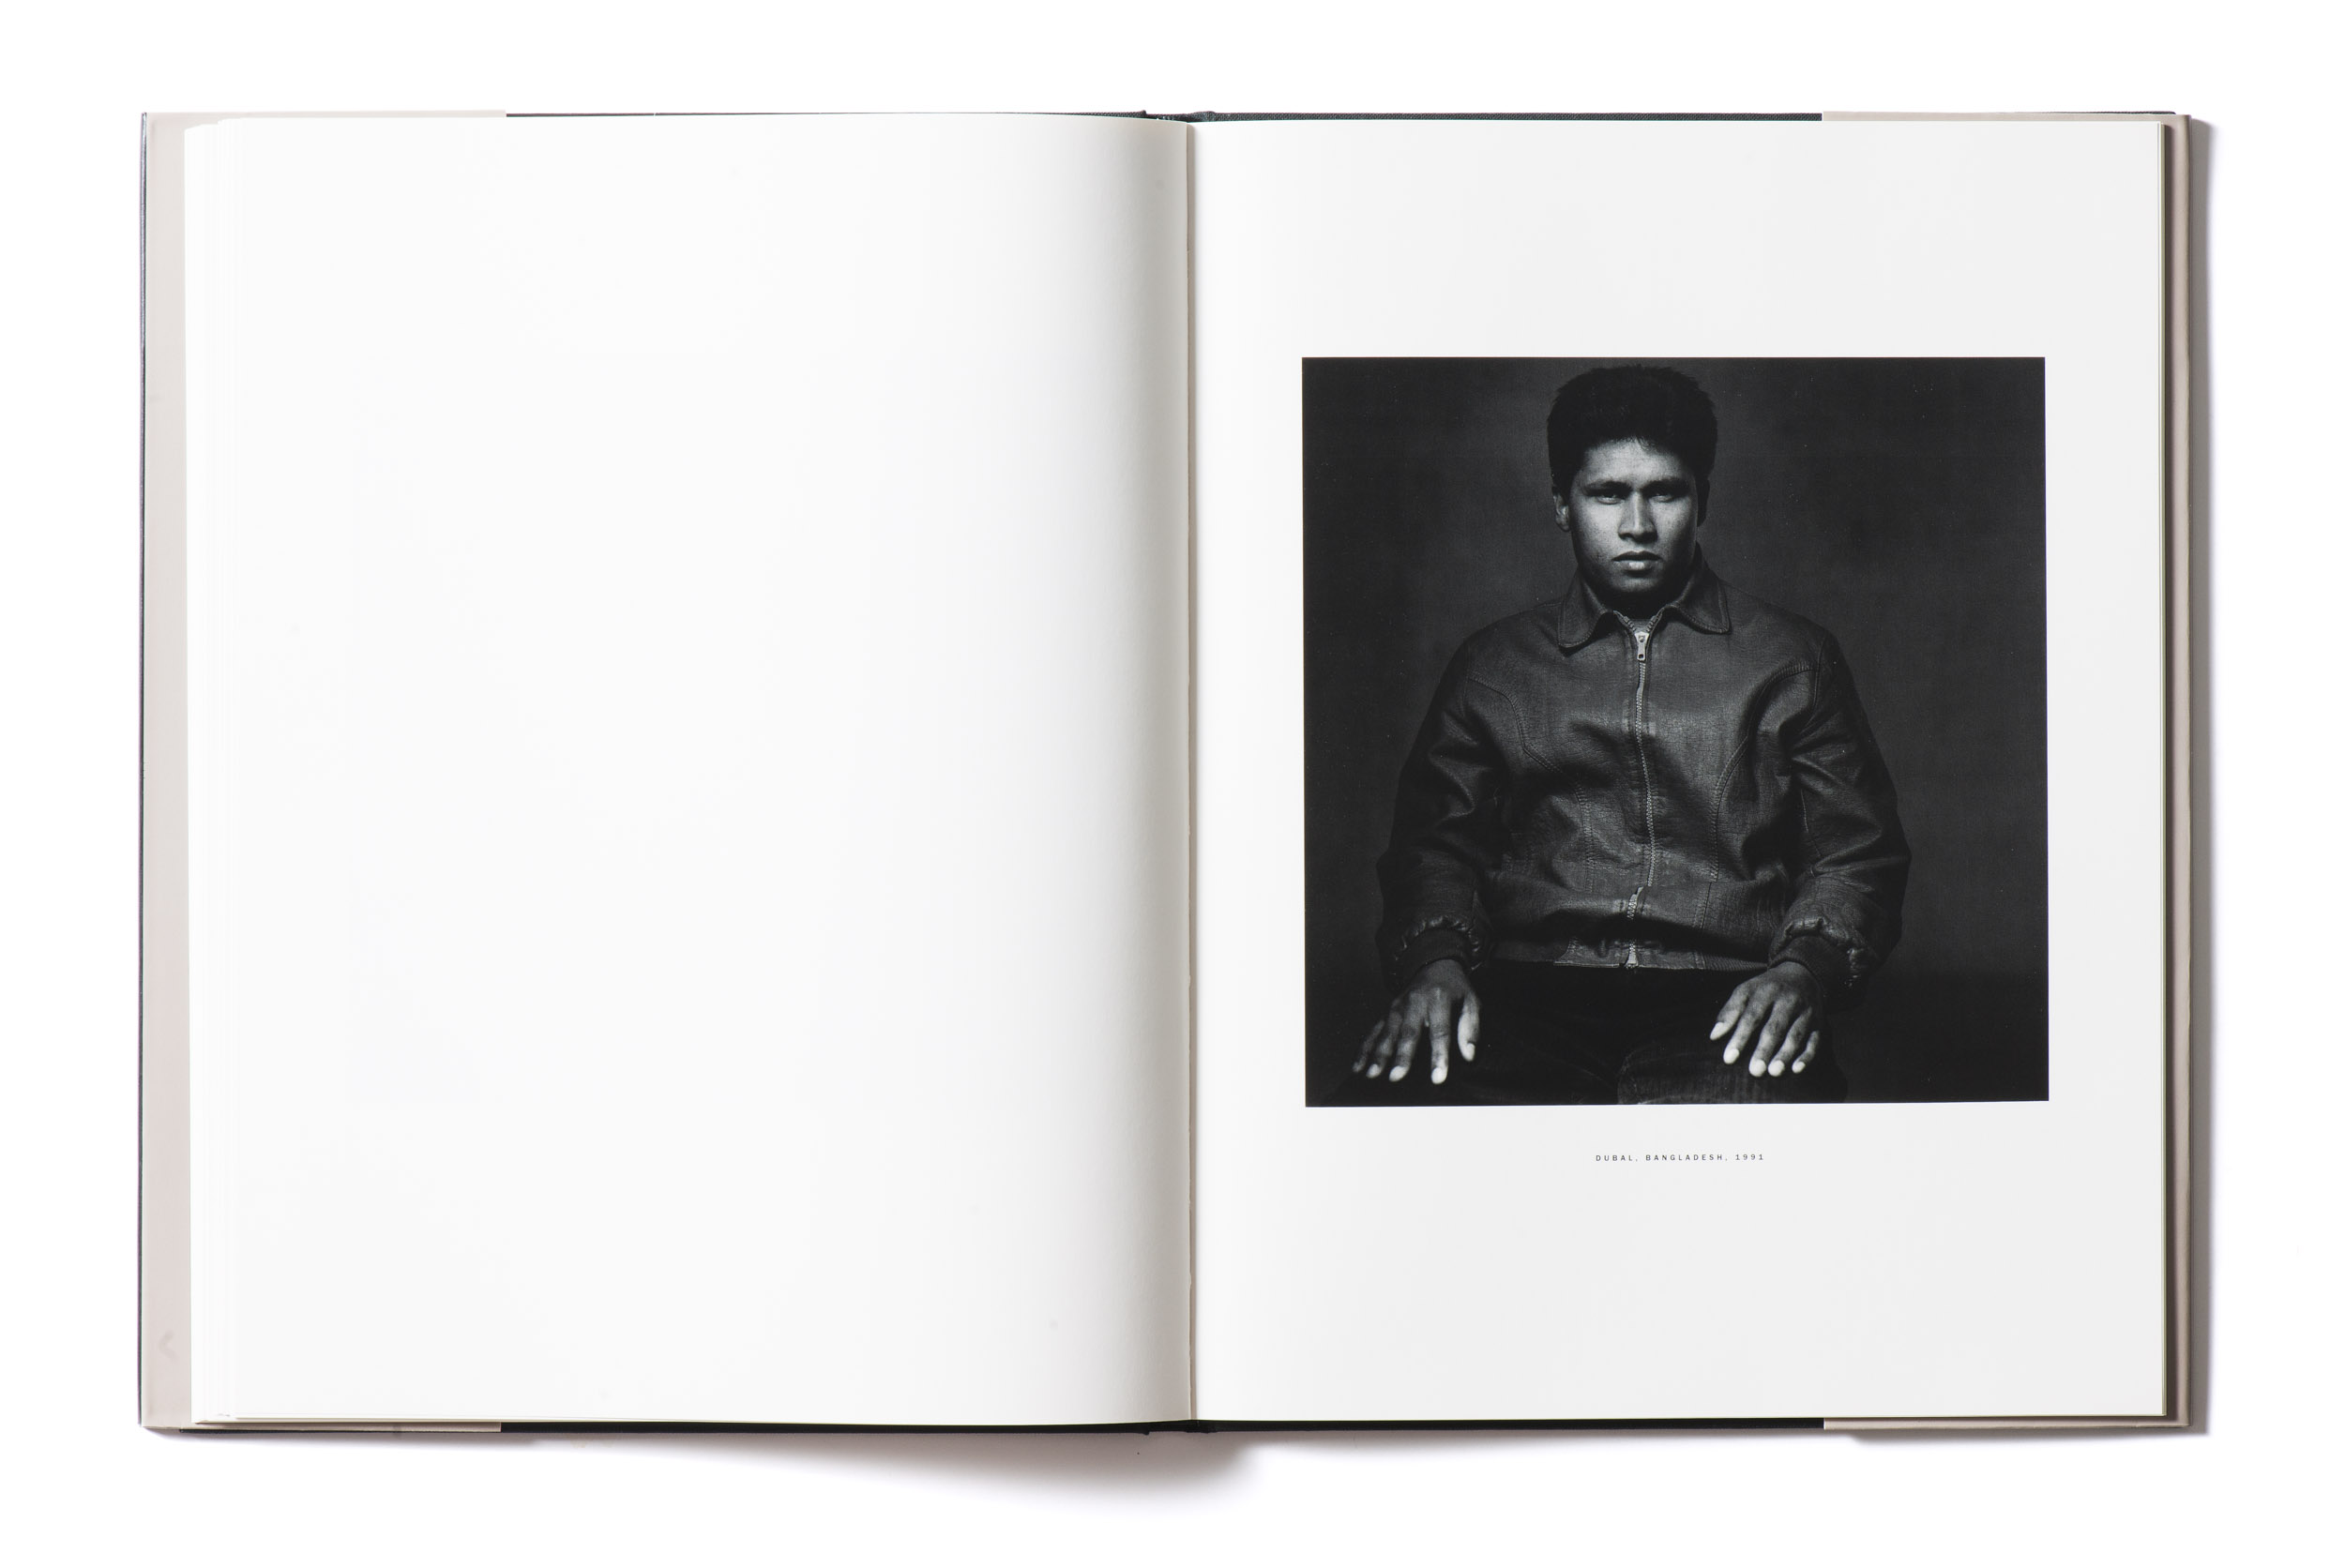 Kunstband Fotografien Peter Hebeisen Titel Feindbilder #8